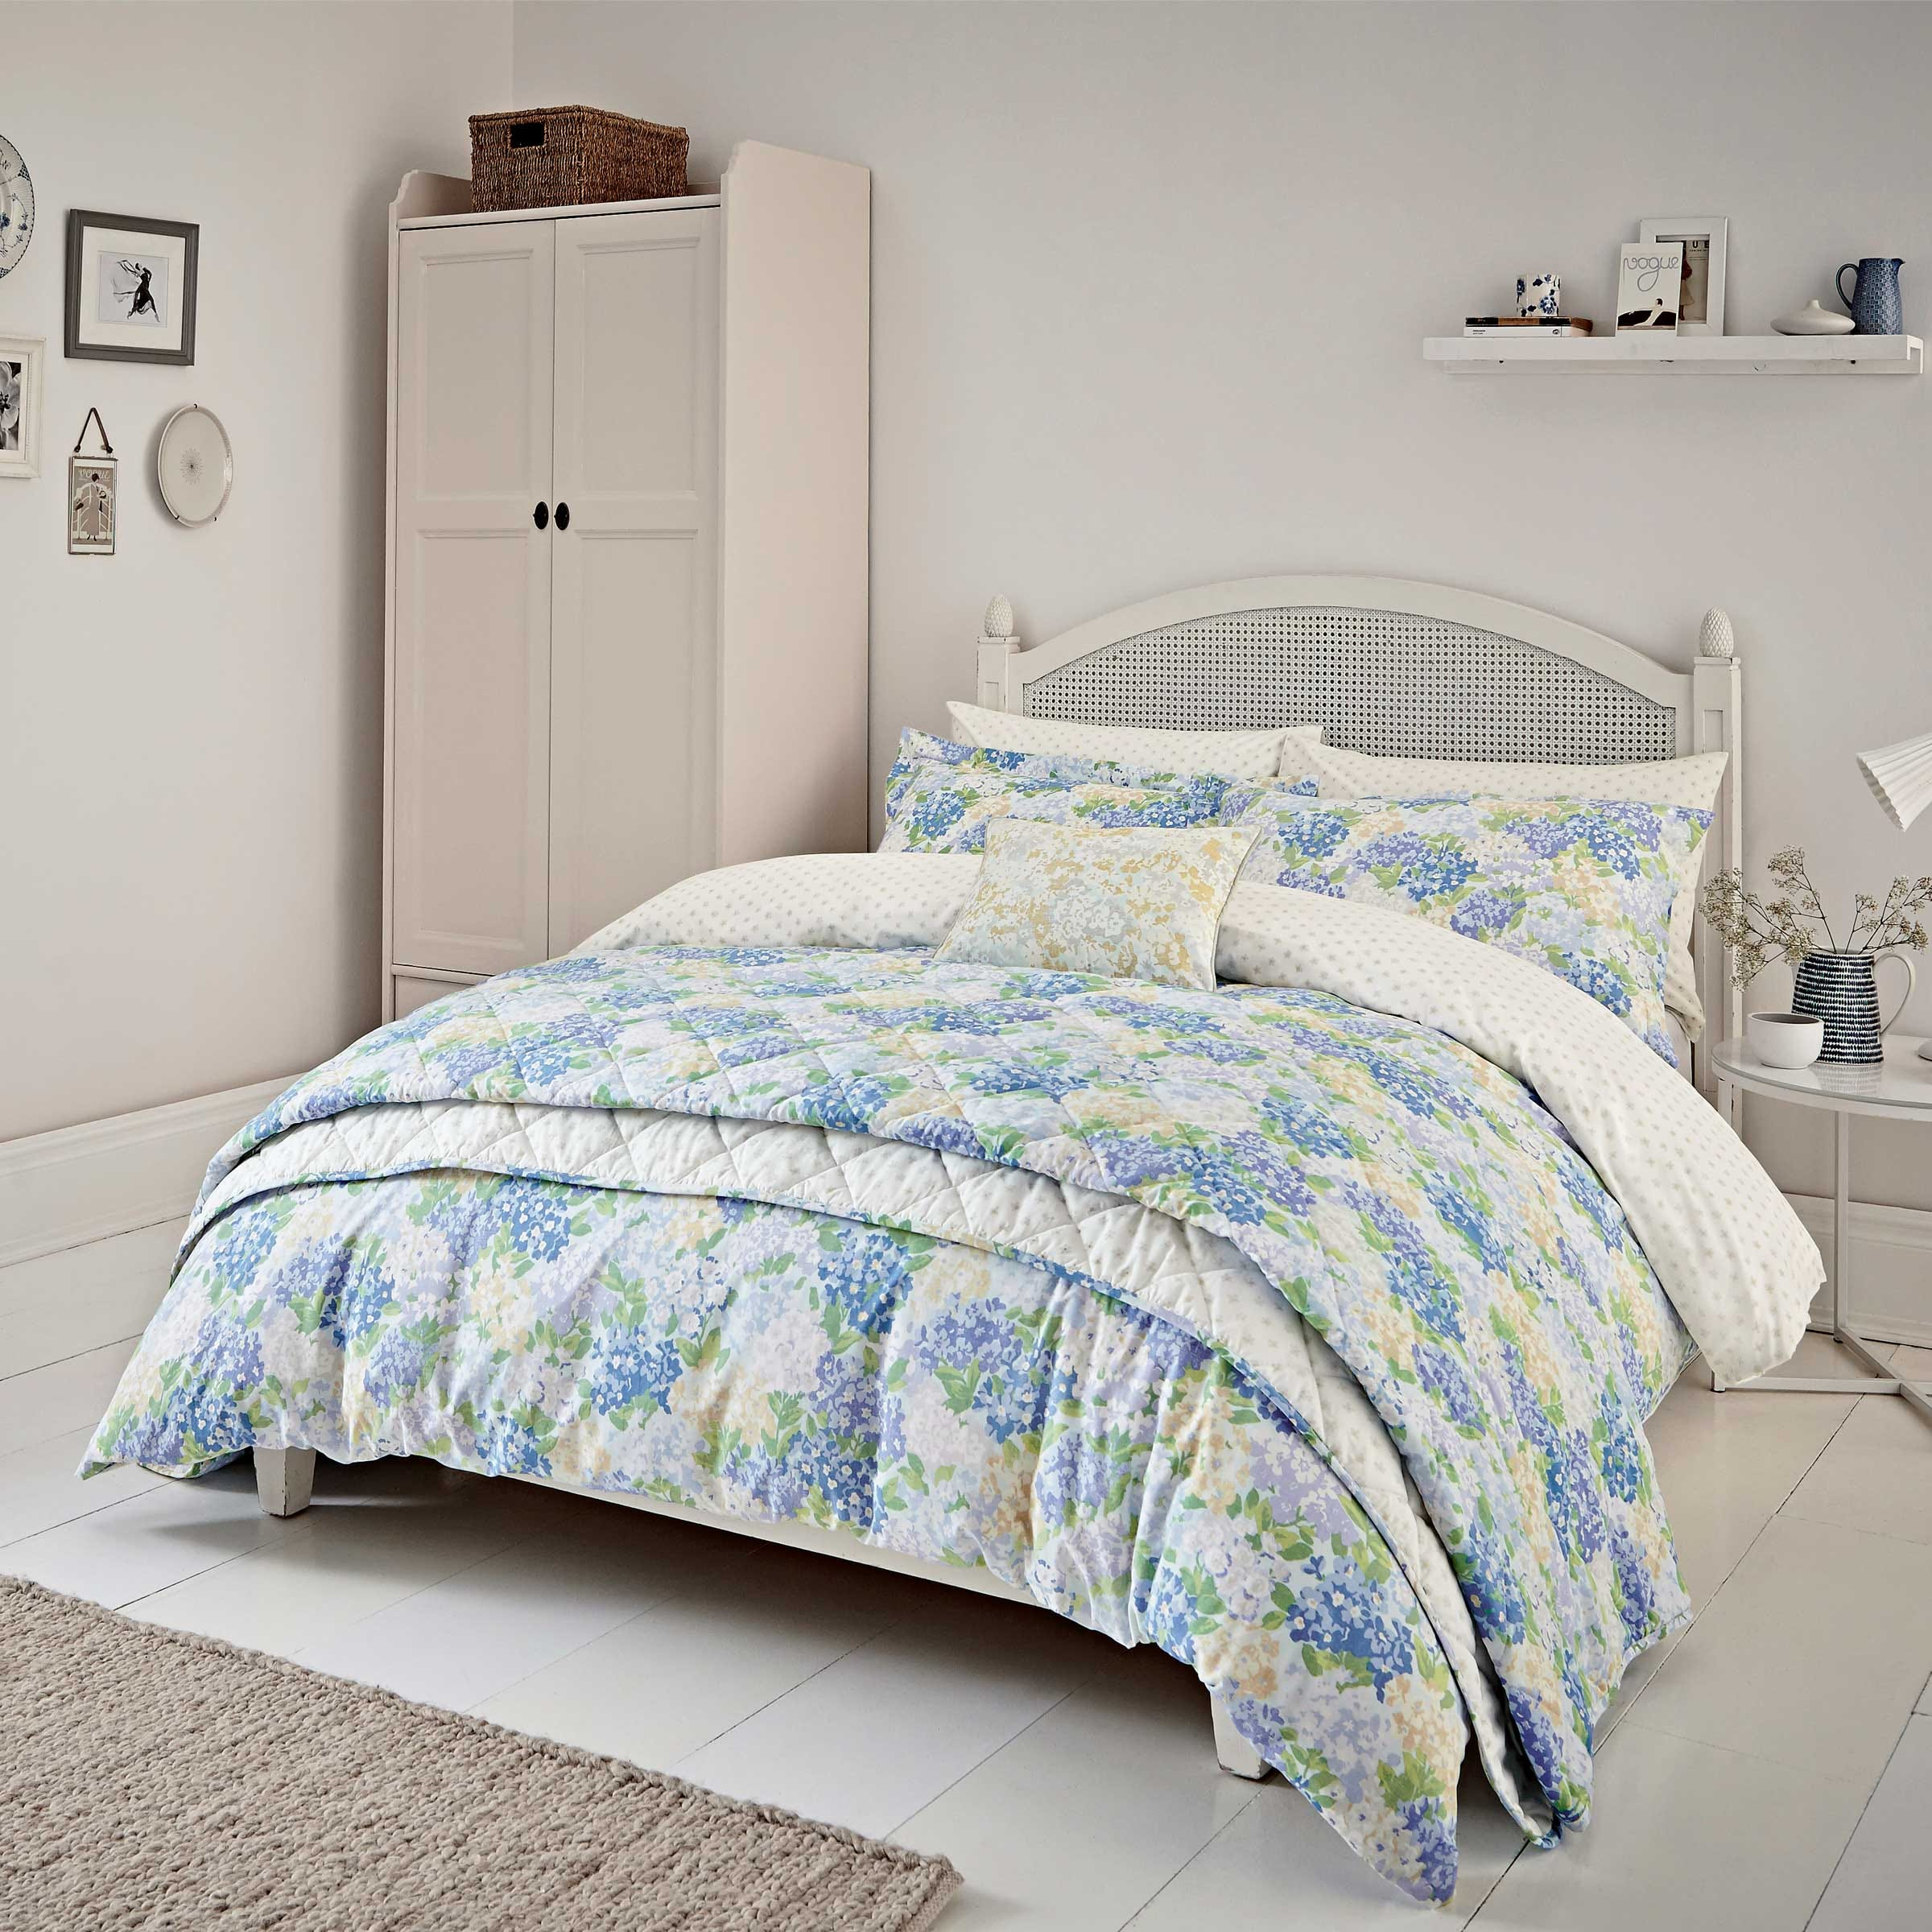 Sanderson Bedding Cottage Garden Single Duvet Cover Set Blue